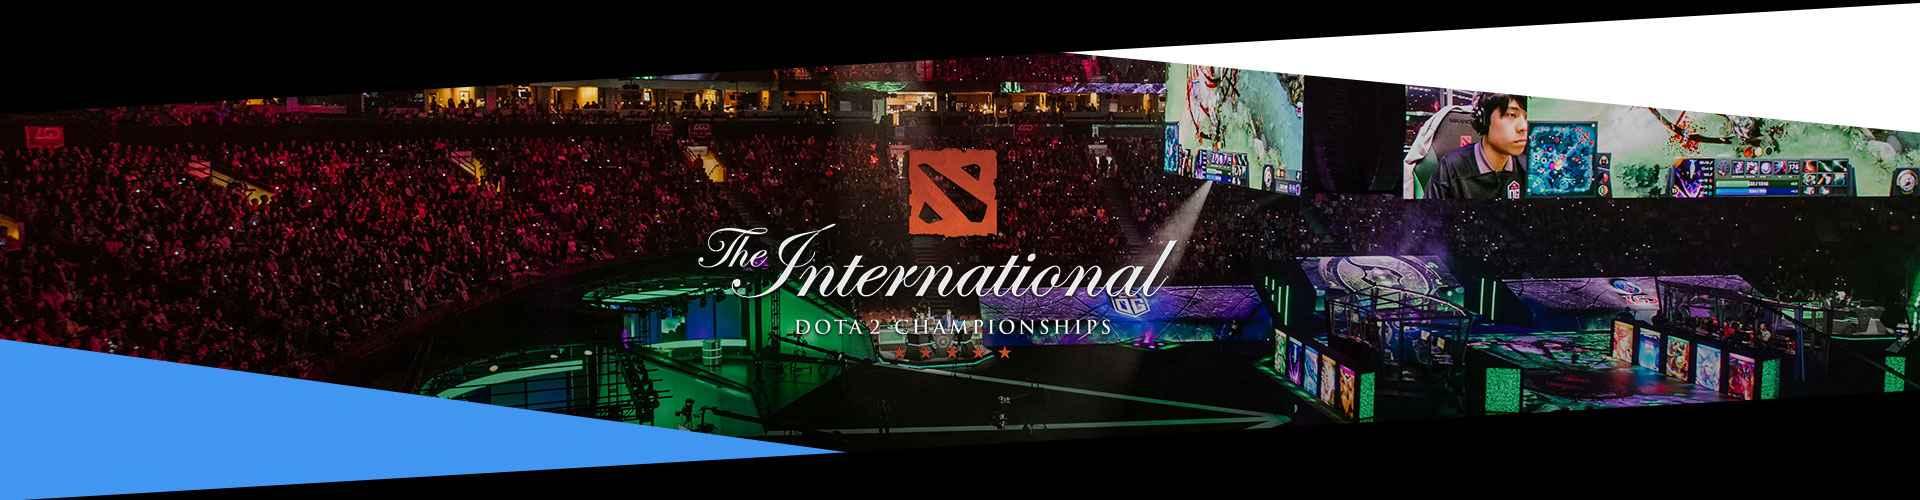 Dota 2 - The International 2018